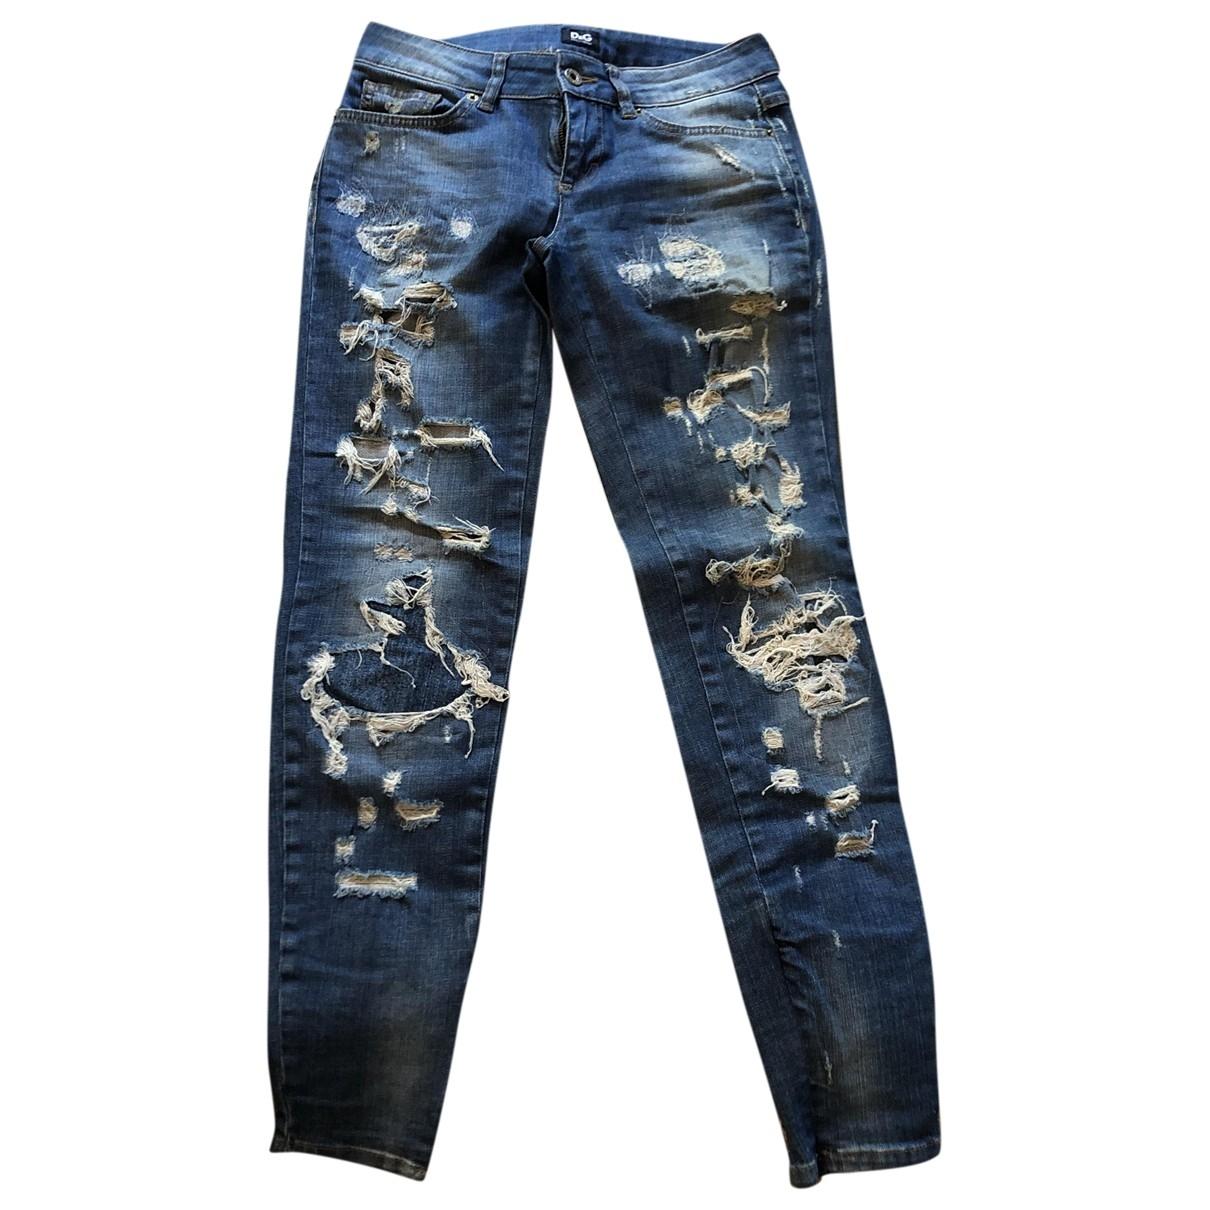 D&g \N Hose in  Blau Denim - Jeans